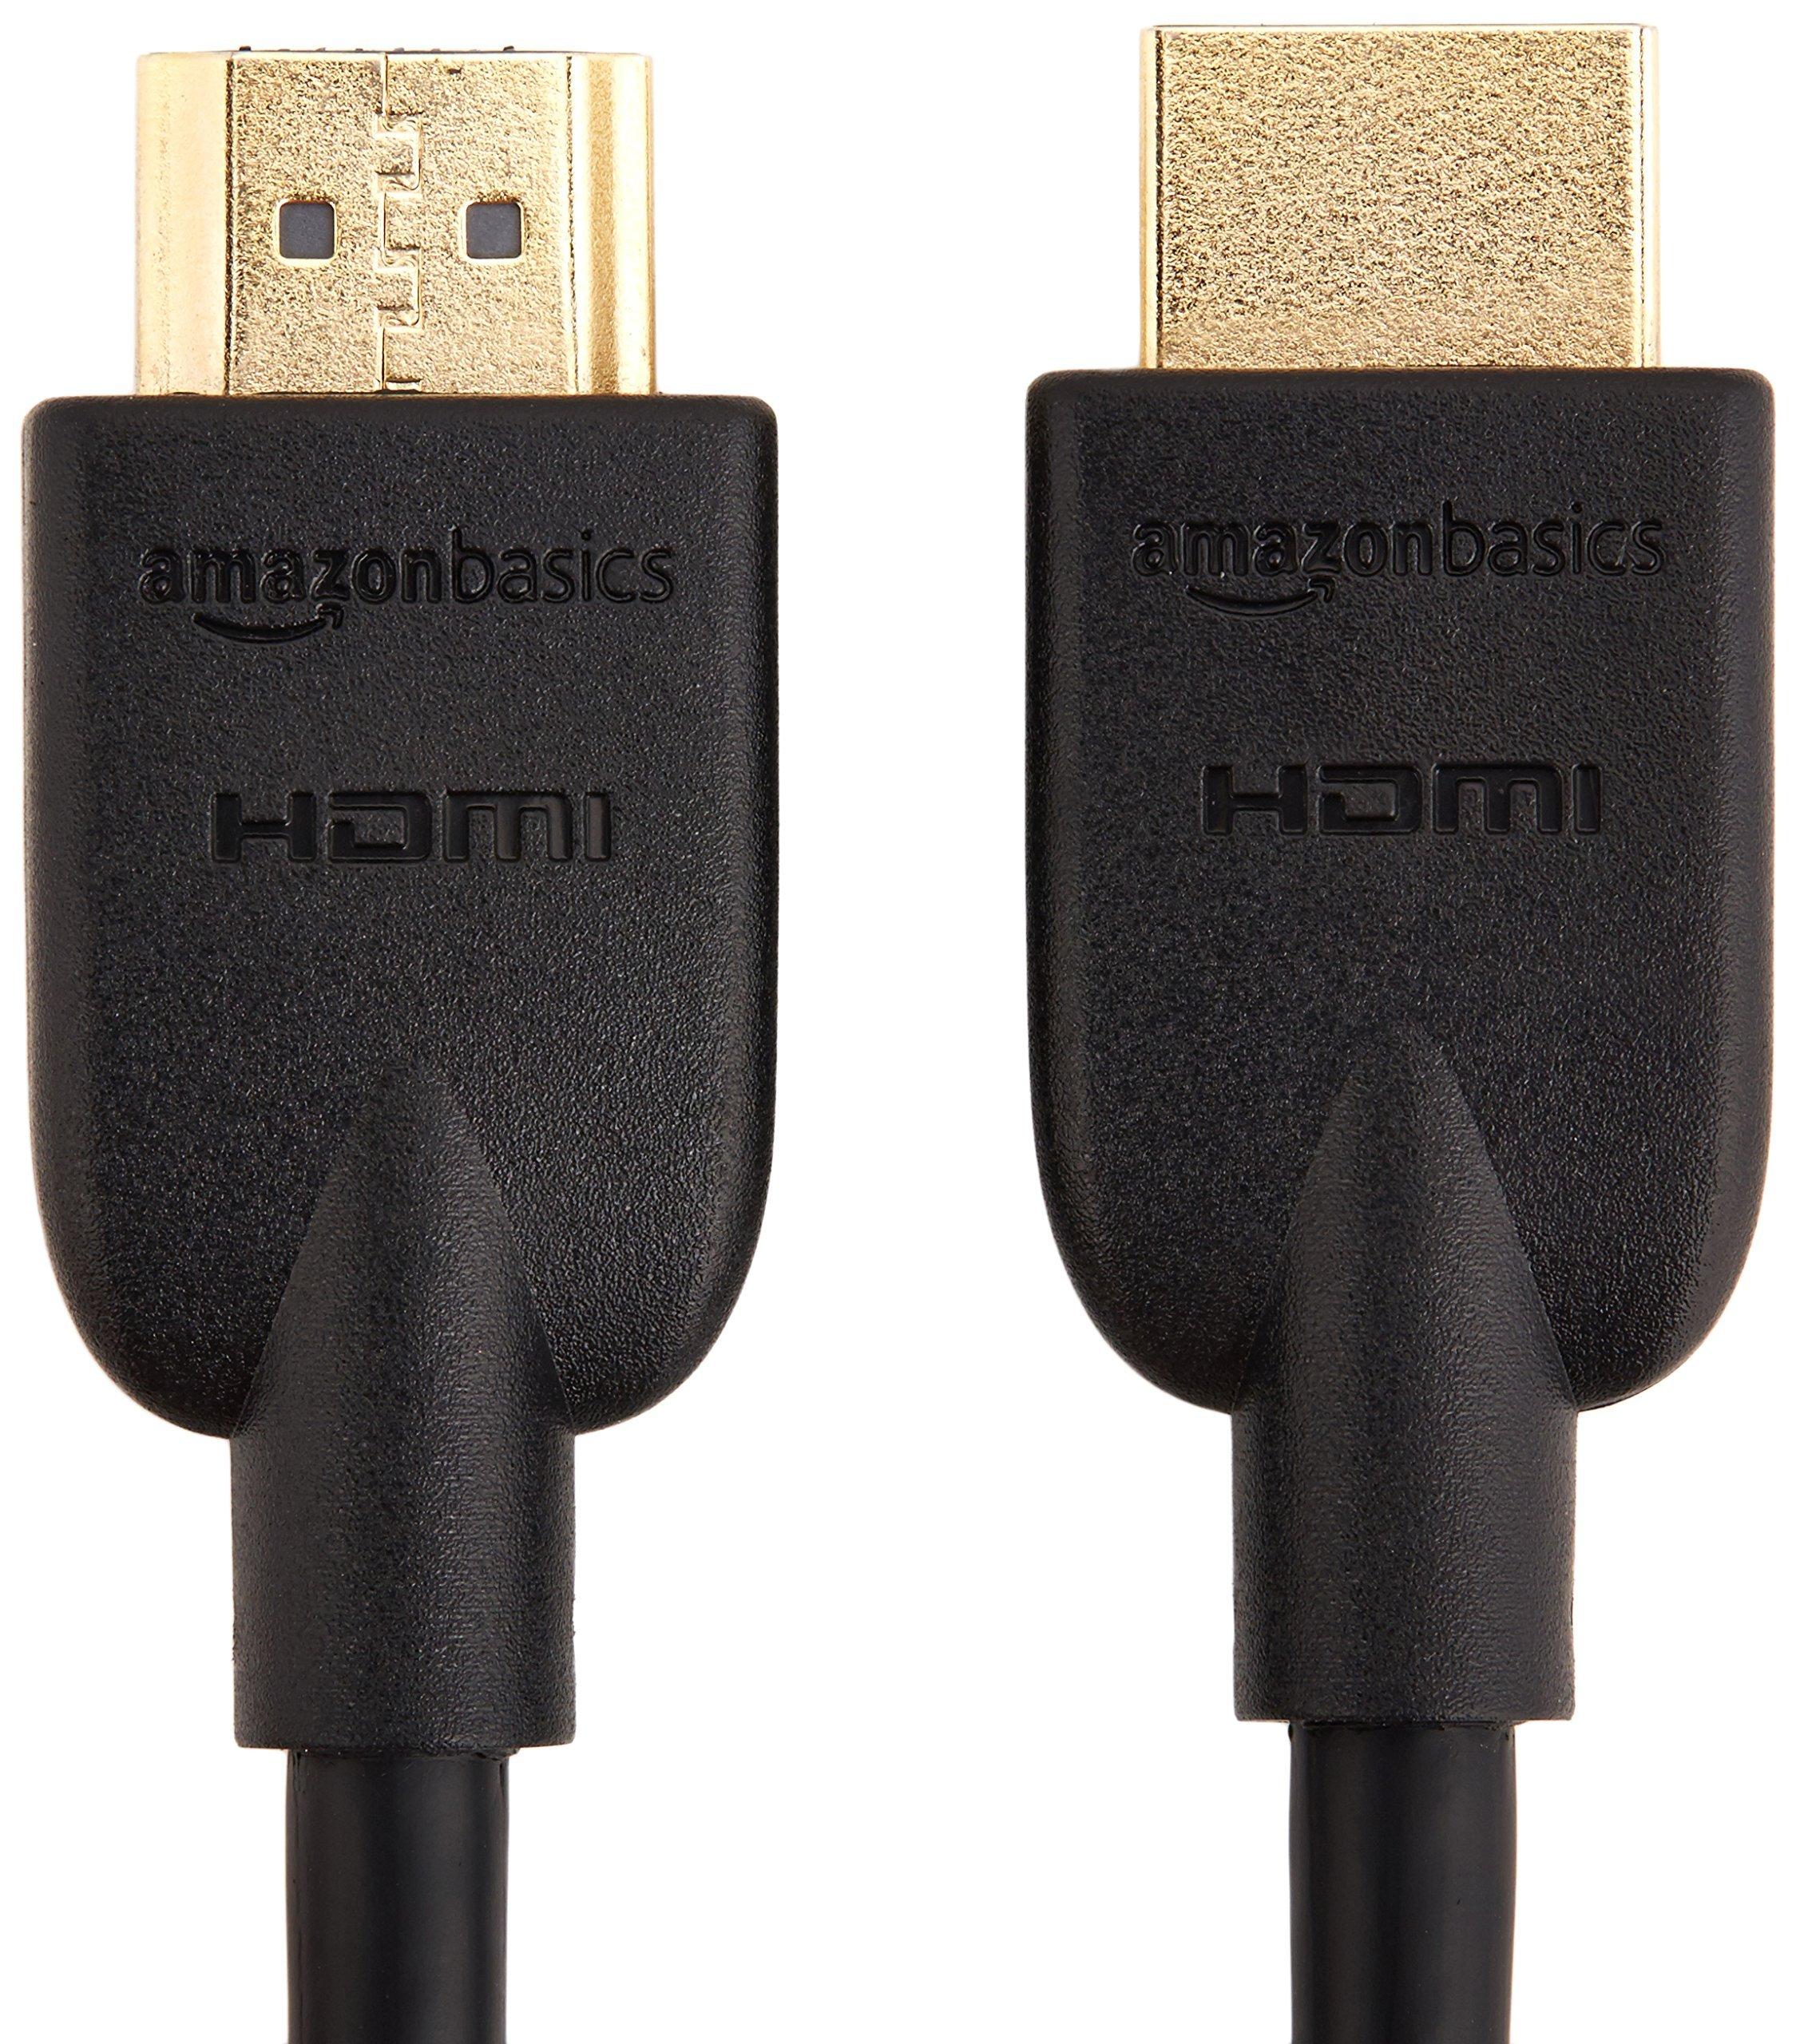 AmazonBasics High-Speed HDMI Cable, 6 Feet, 3-Pack by AmazonBasics (Image #5)